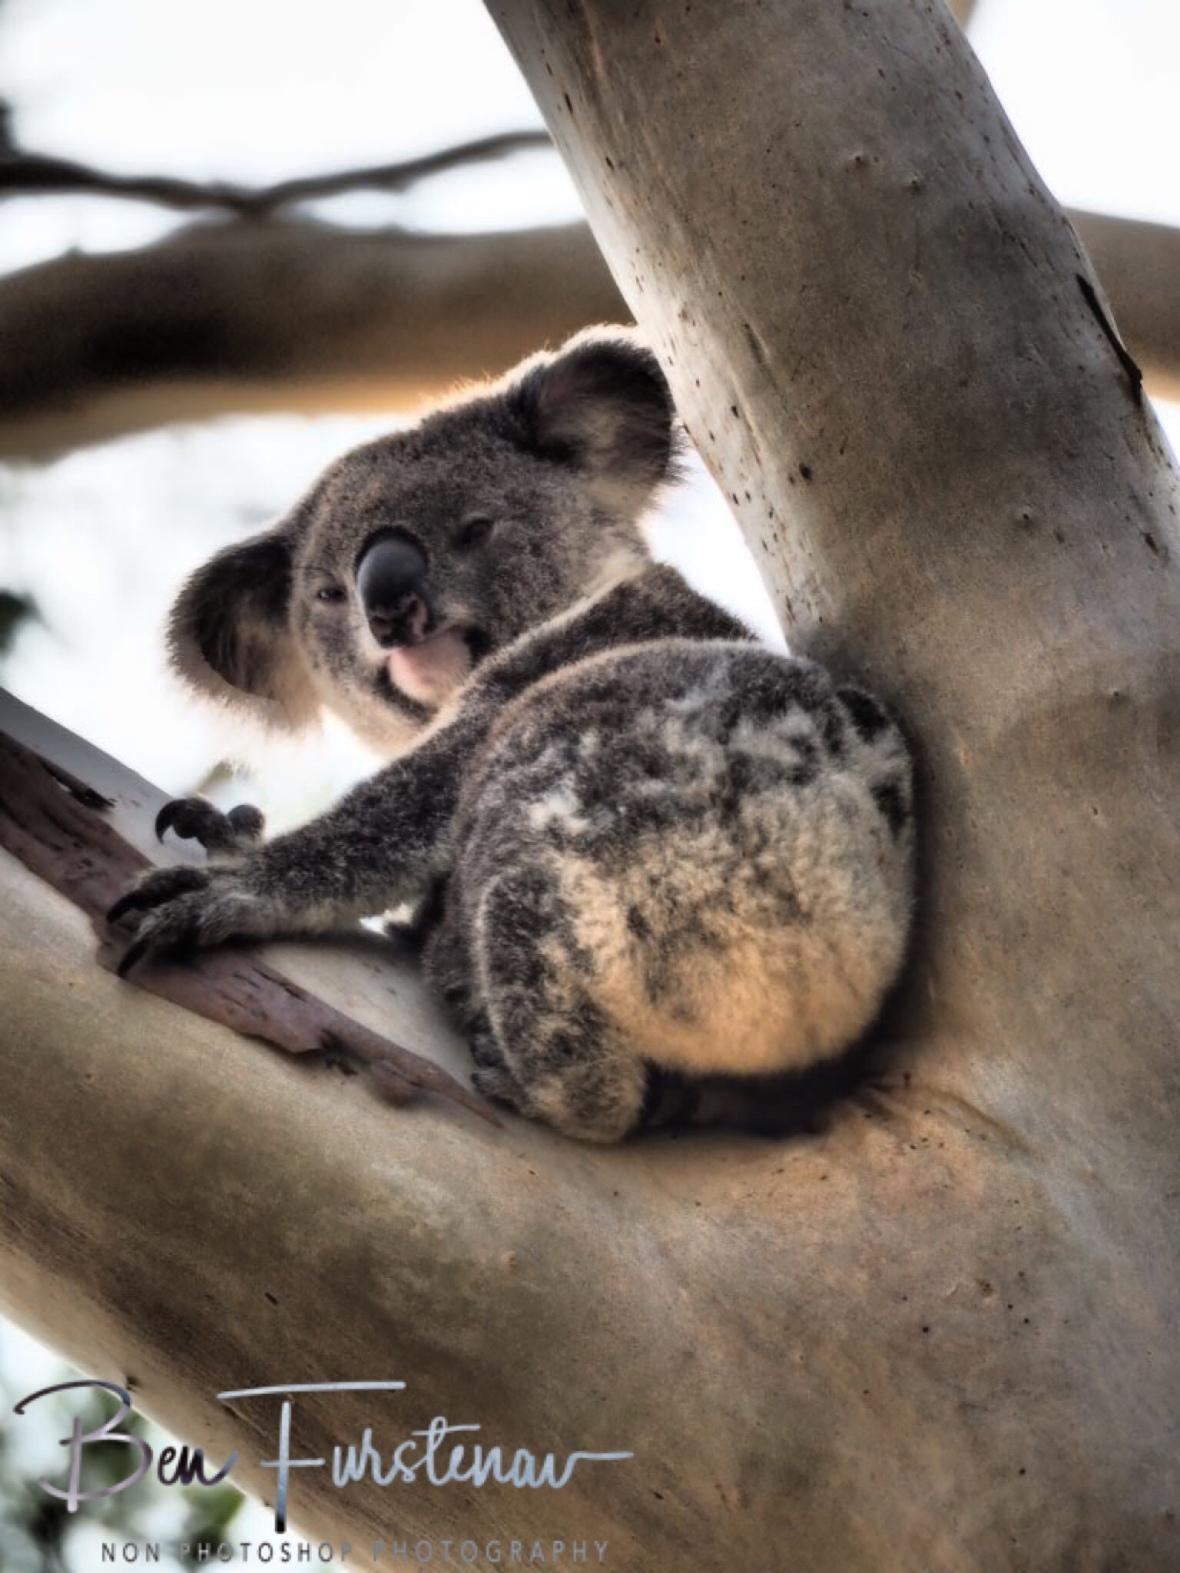 Different koala, same impression  at Woodburn, Northern New South Wales, Australia